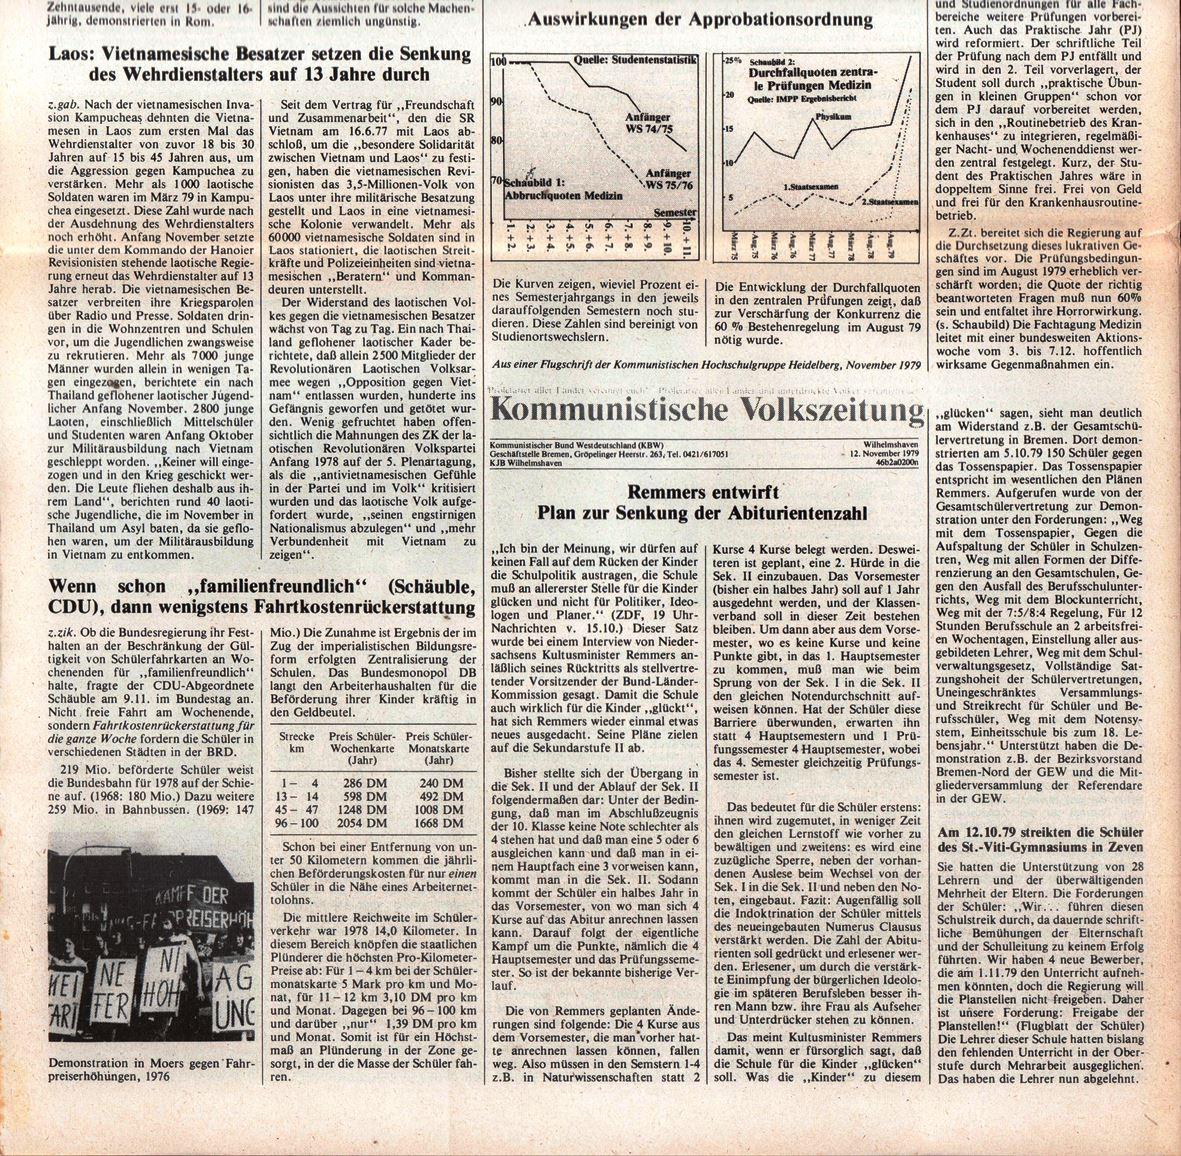 Hamburg_KVZ_1979_48_24